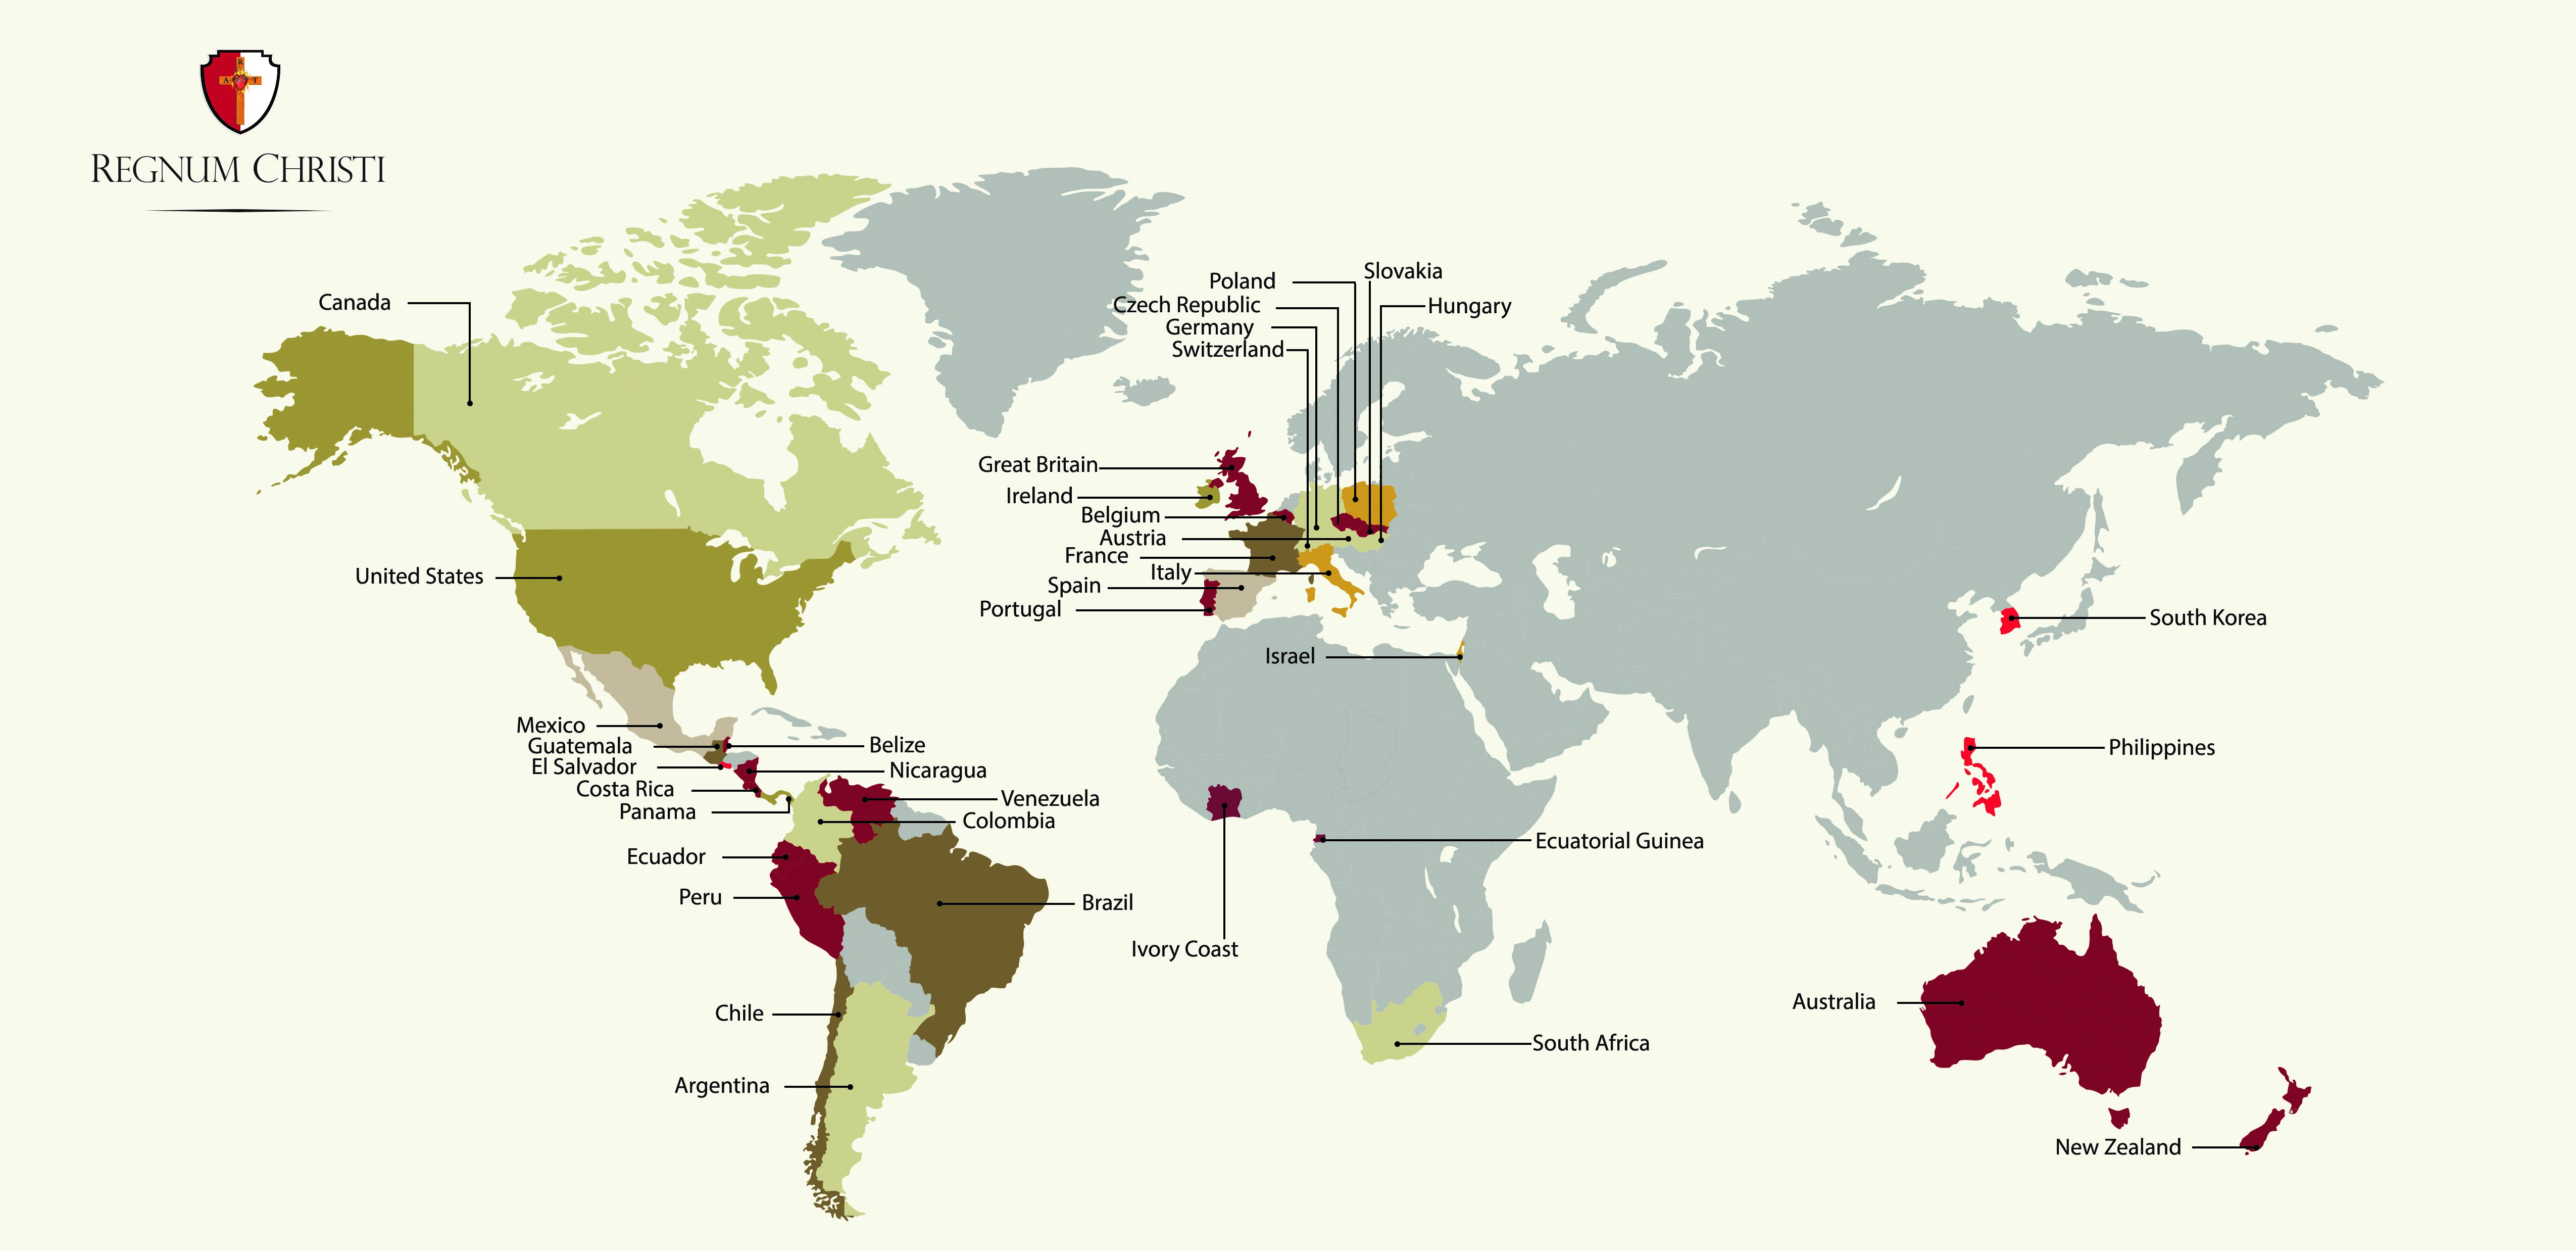 Map Regnum Christi